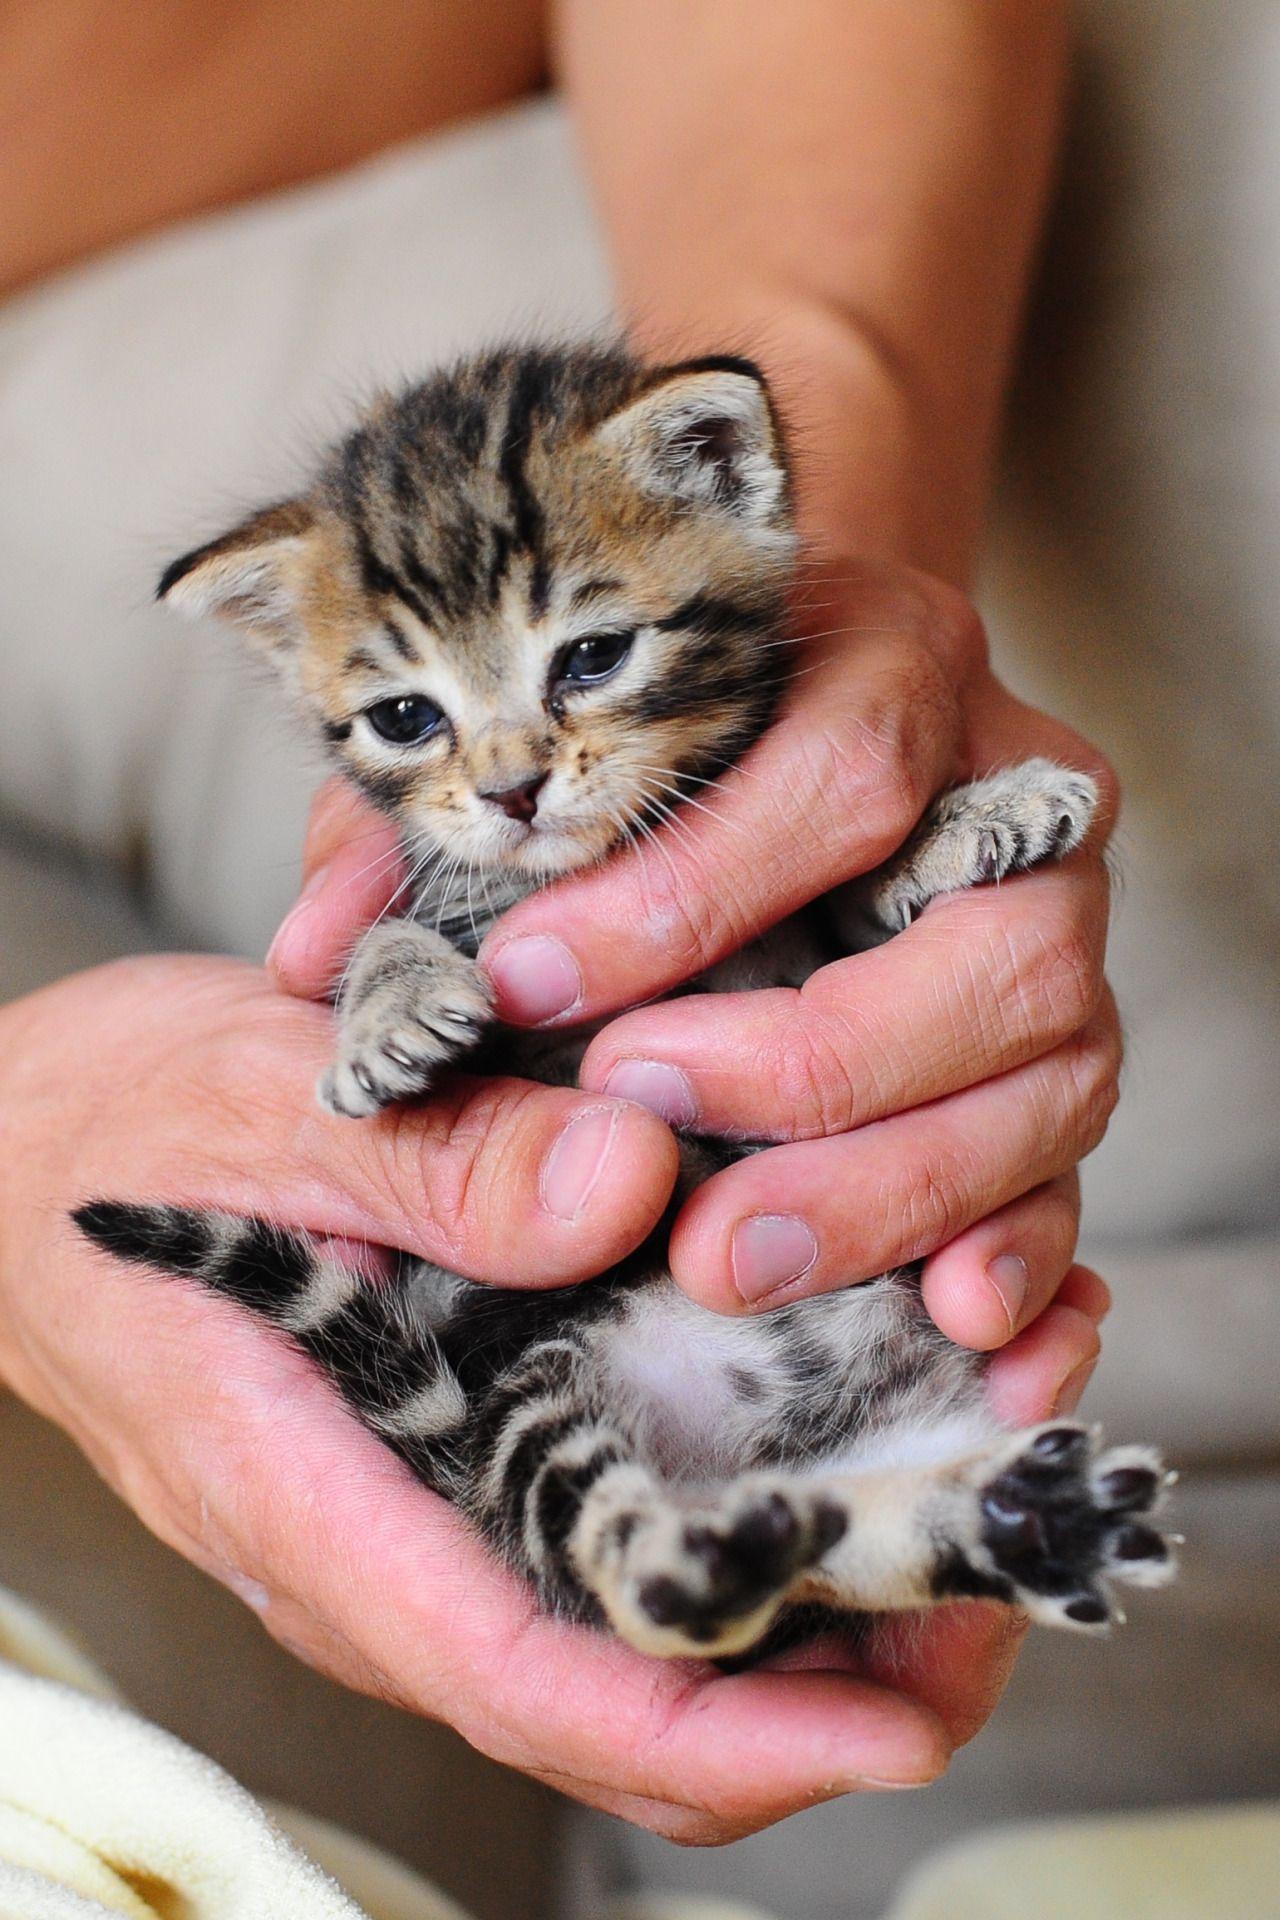 Coffeepearlsandpoetry Kittens Cutest Kittens Cutest Baby Cute